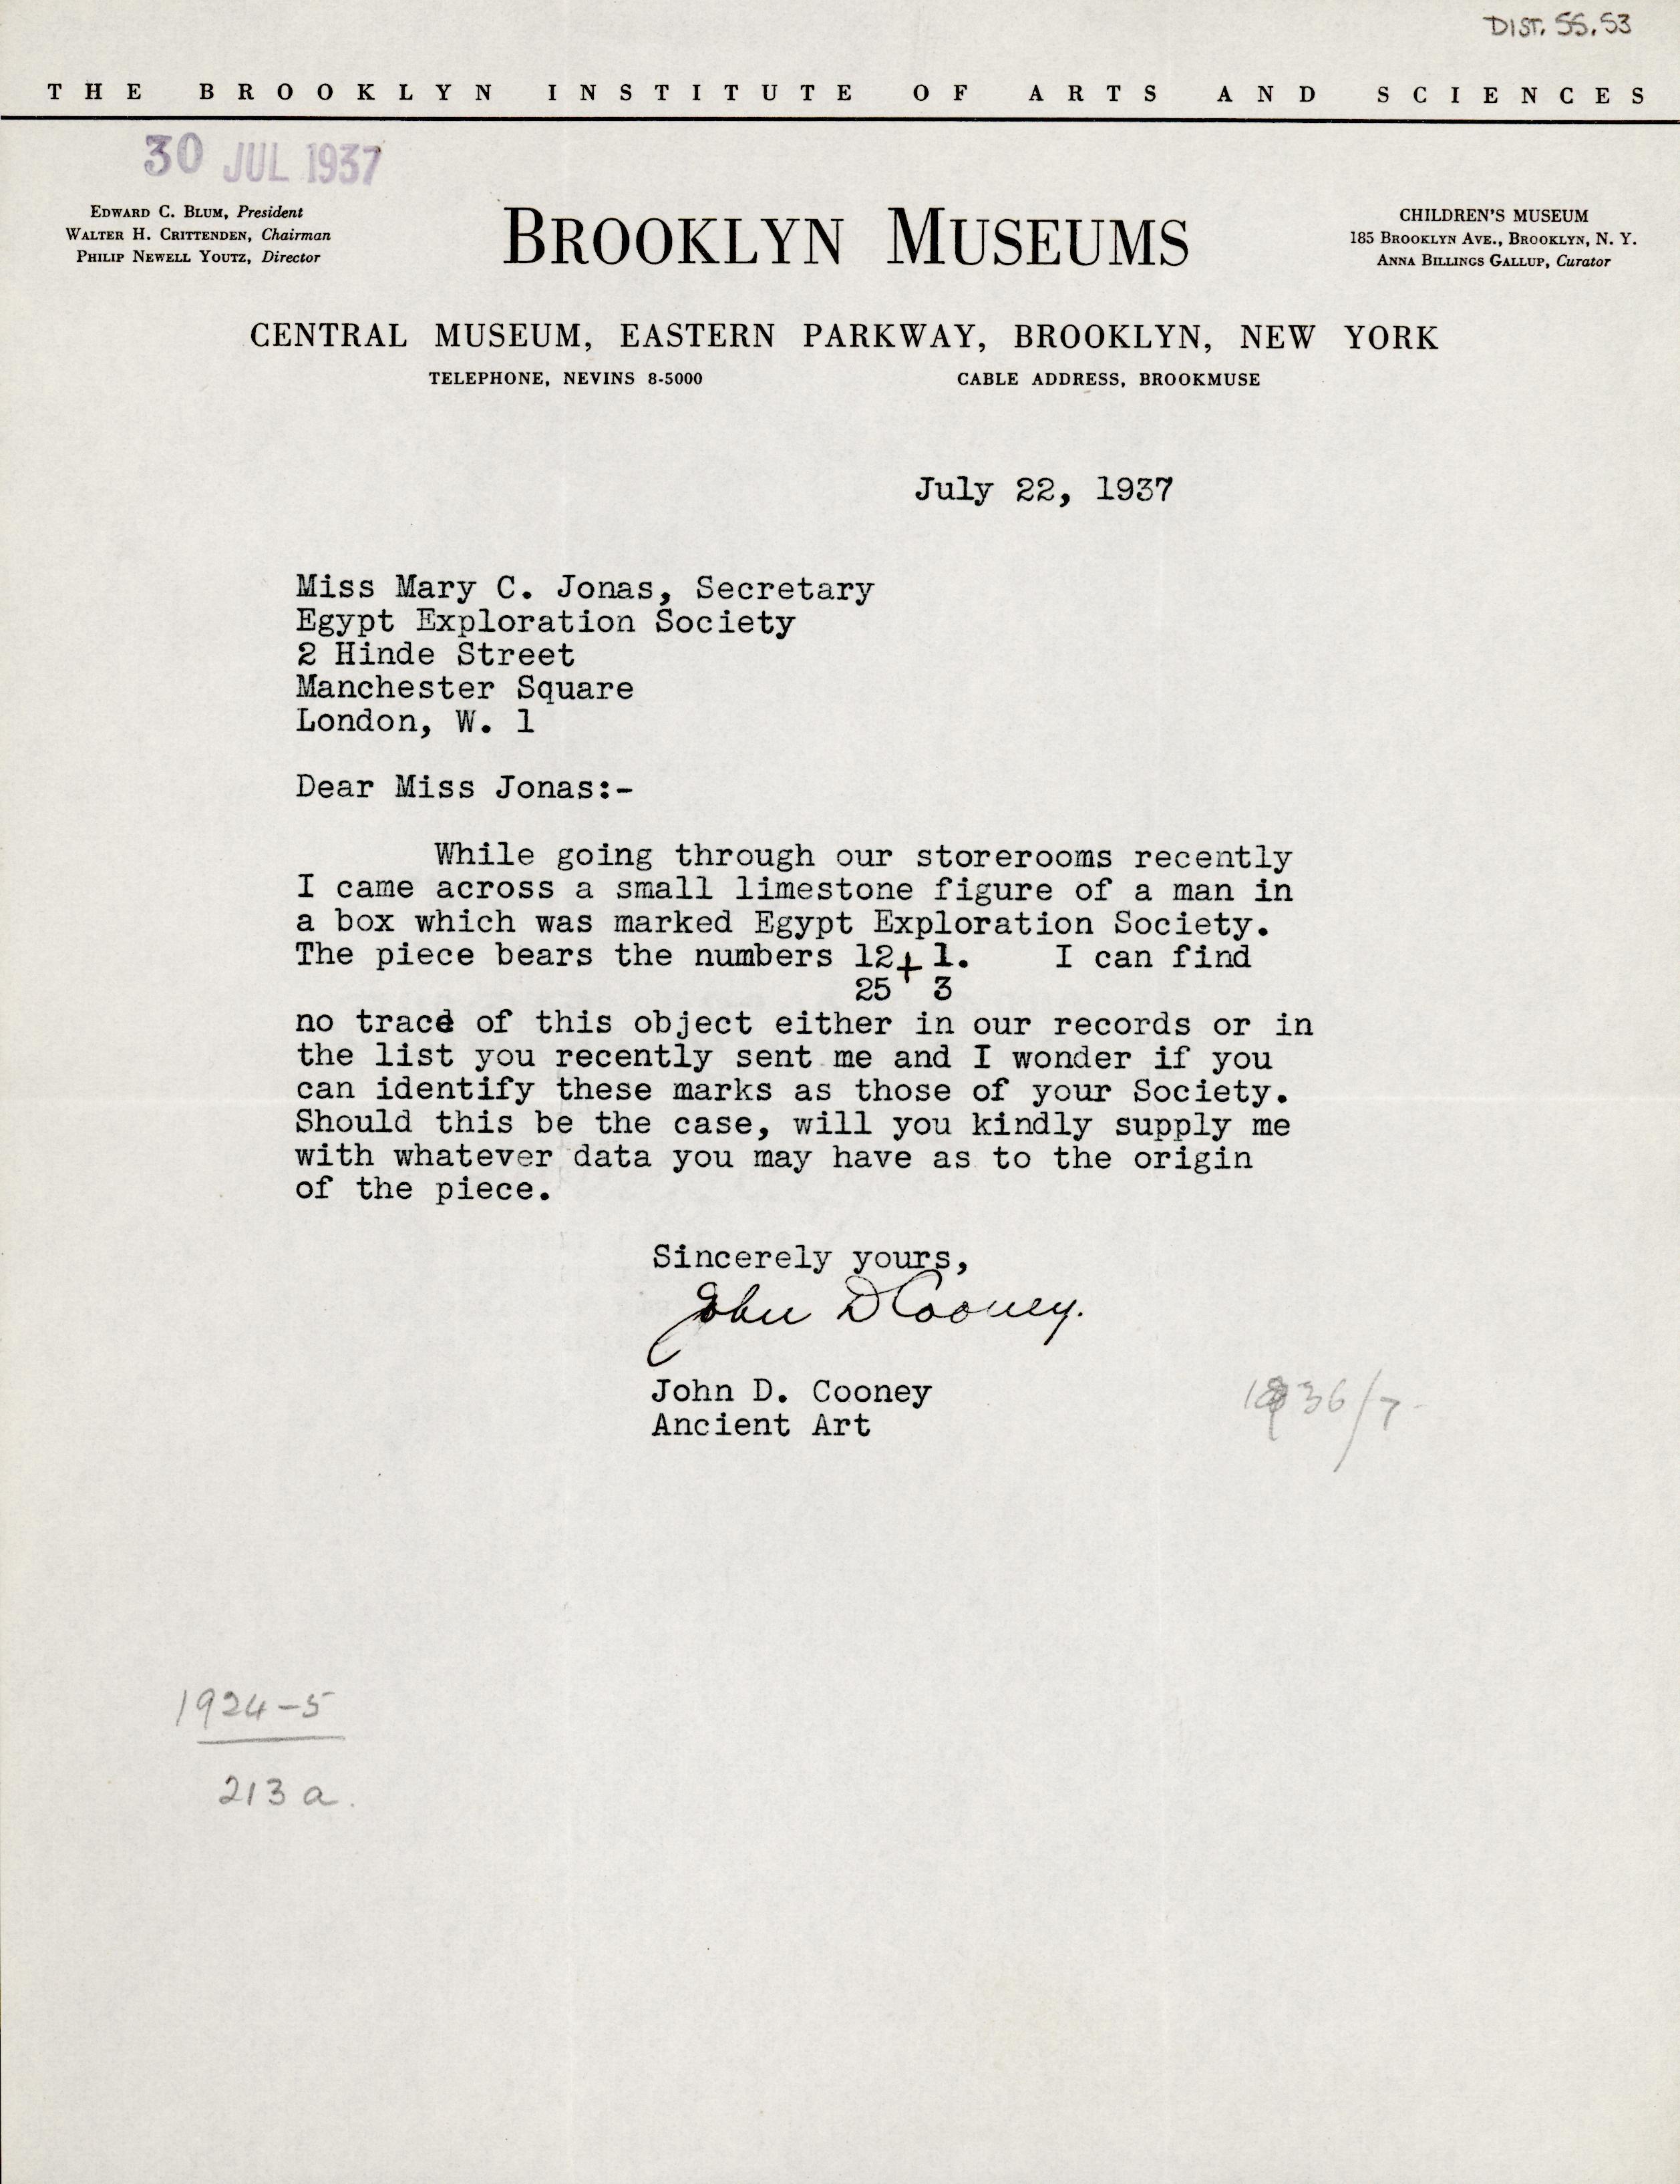 1931-44 Brooklyn Museum DIST.55.53